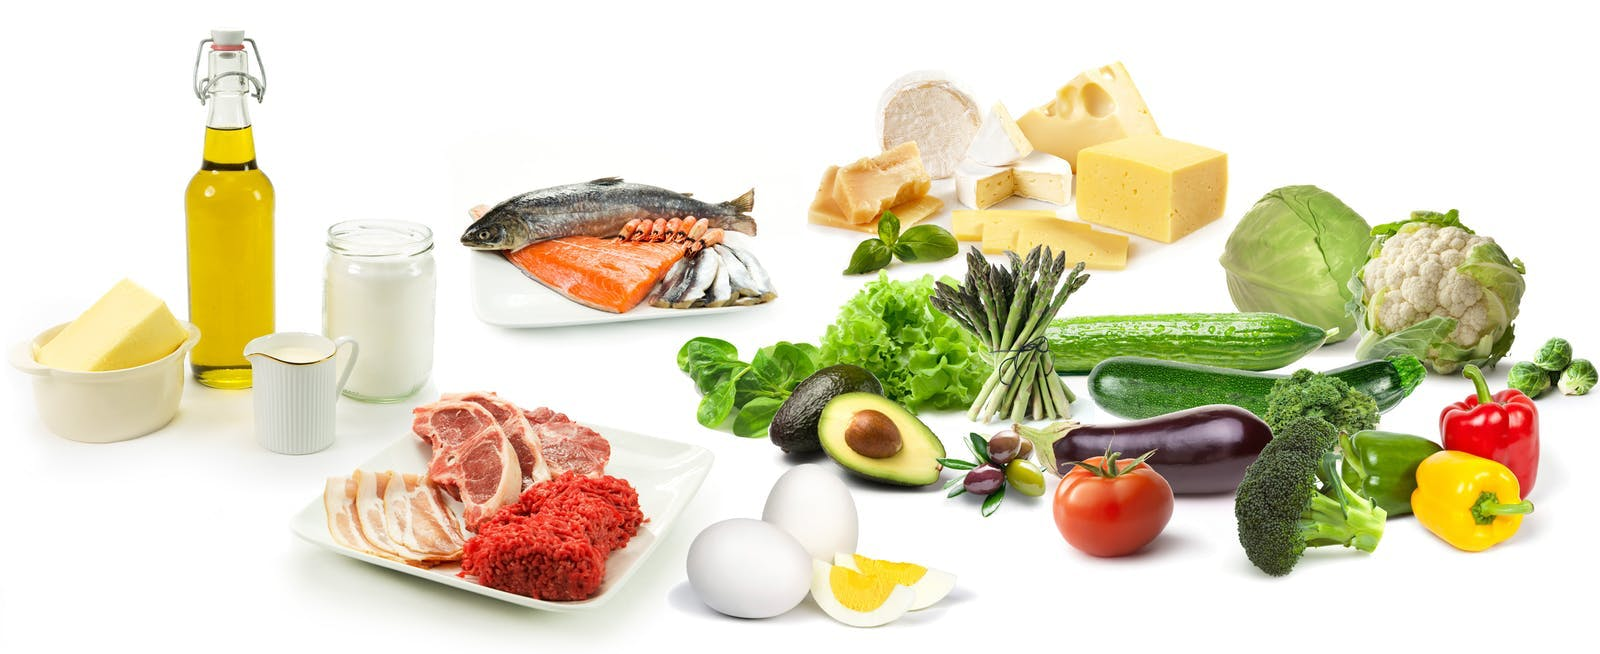 keto-foods-guide-3